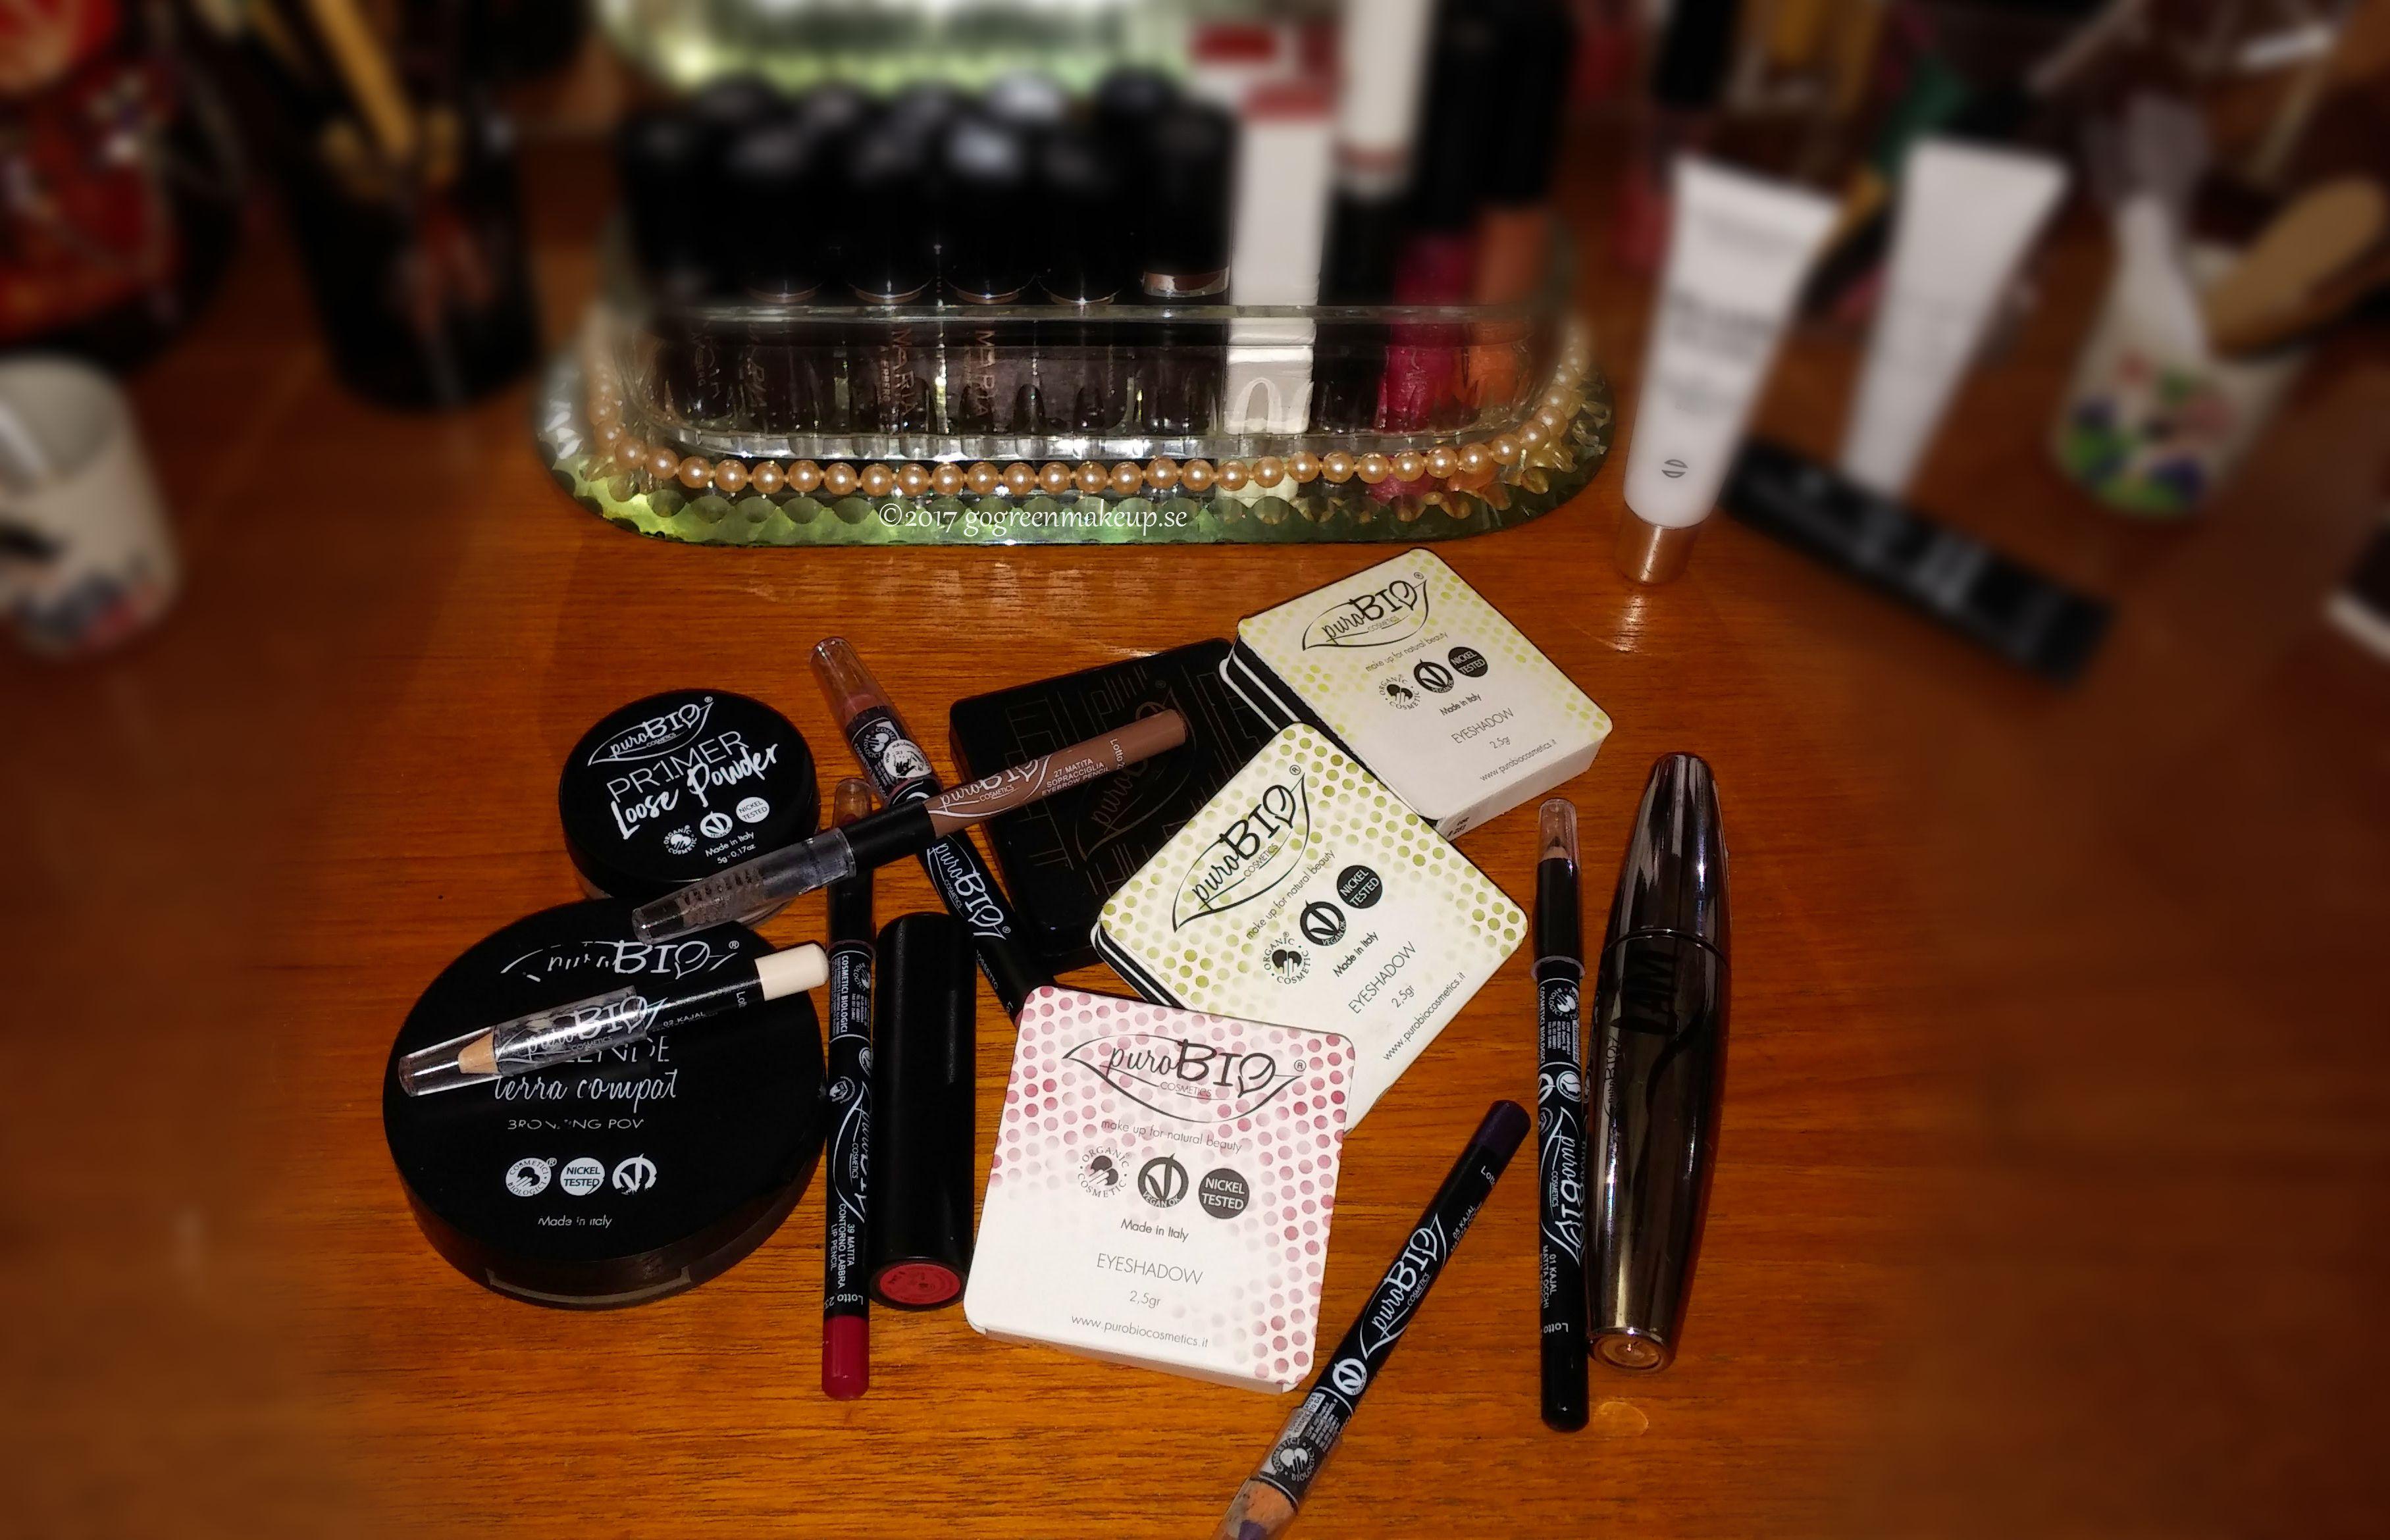 purobio cosmetics makeup